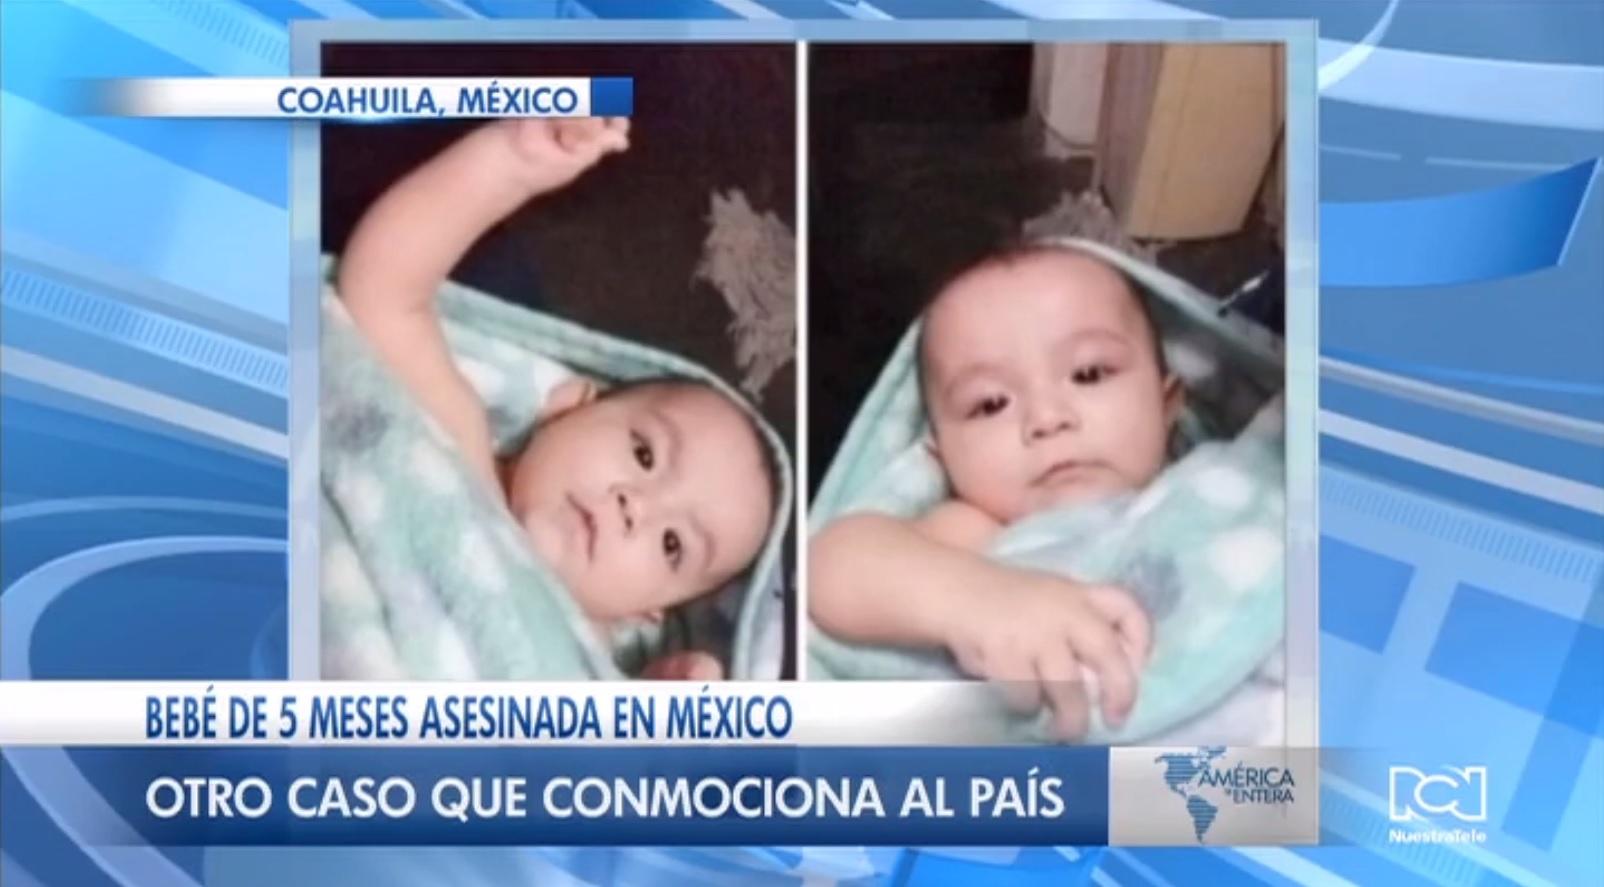 Encuentran cuerpo de niña de 5 meses que había sido reportada como robada en México